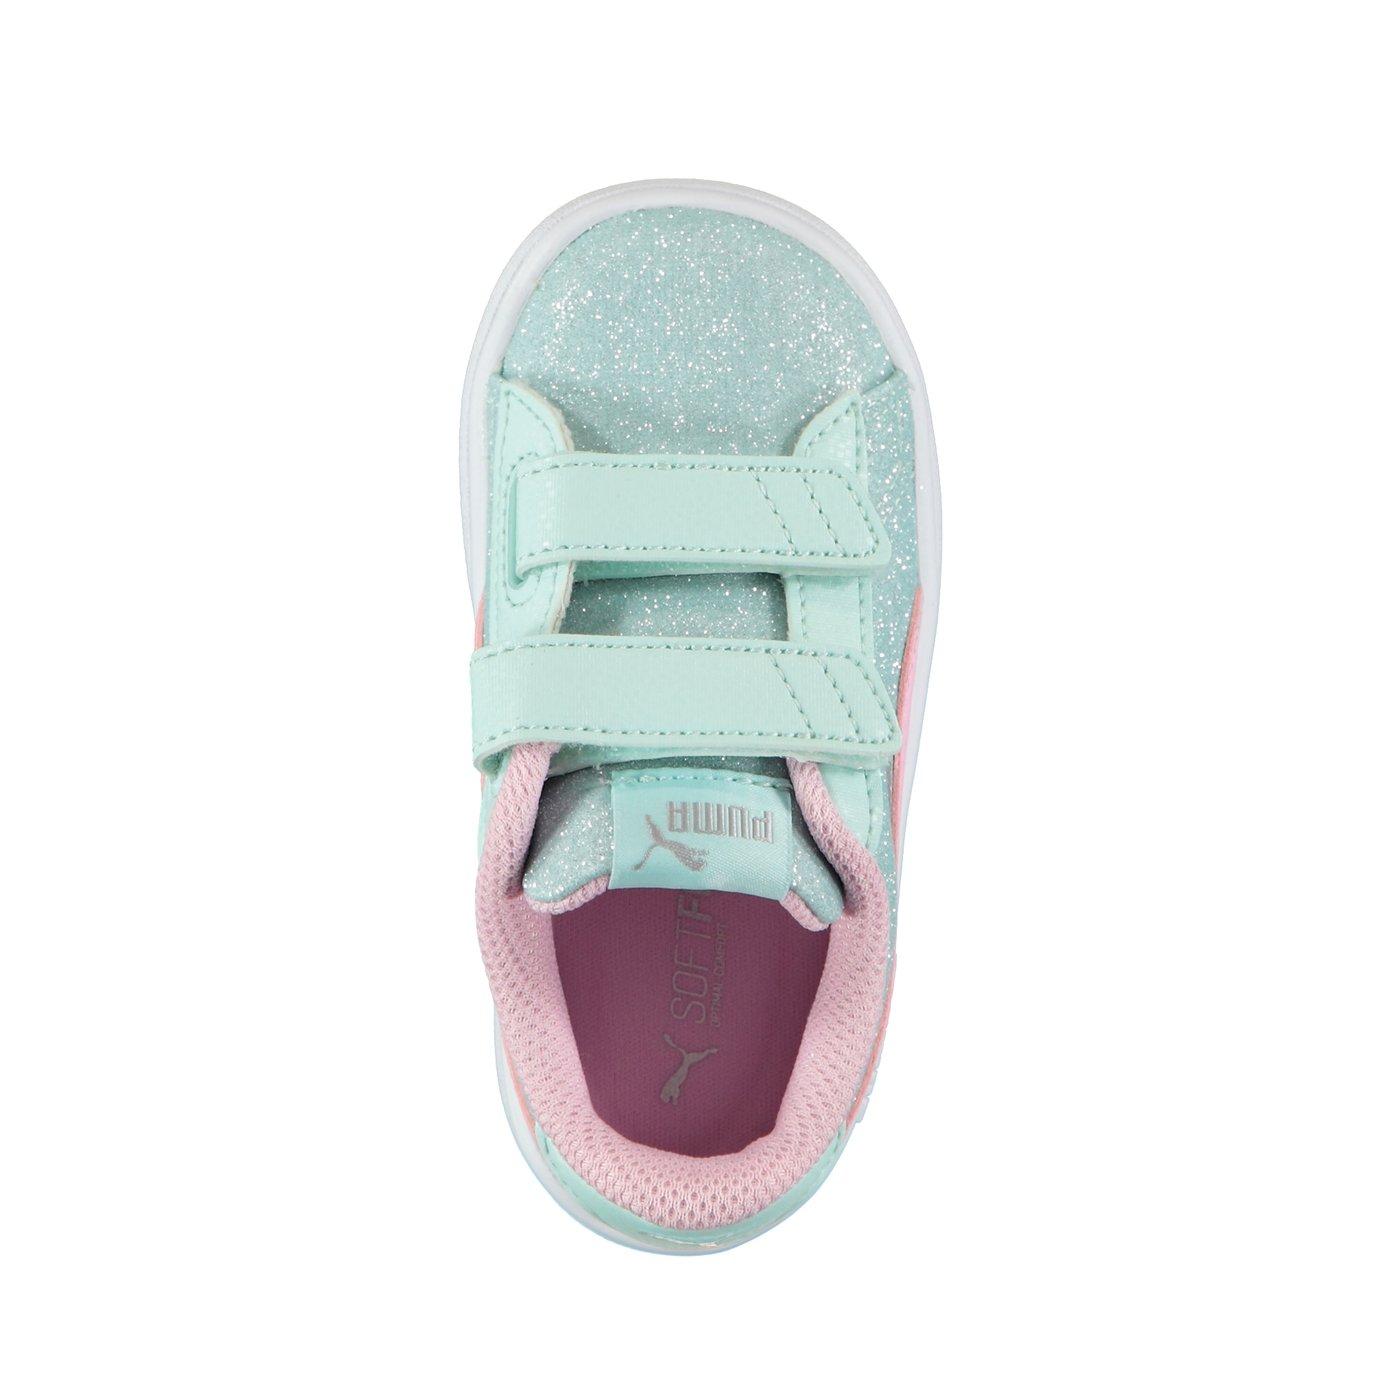 Puma Smash V2 Glitz Glam Çocuk Mavi Spor Ayakkabı